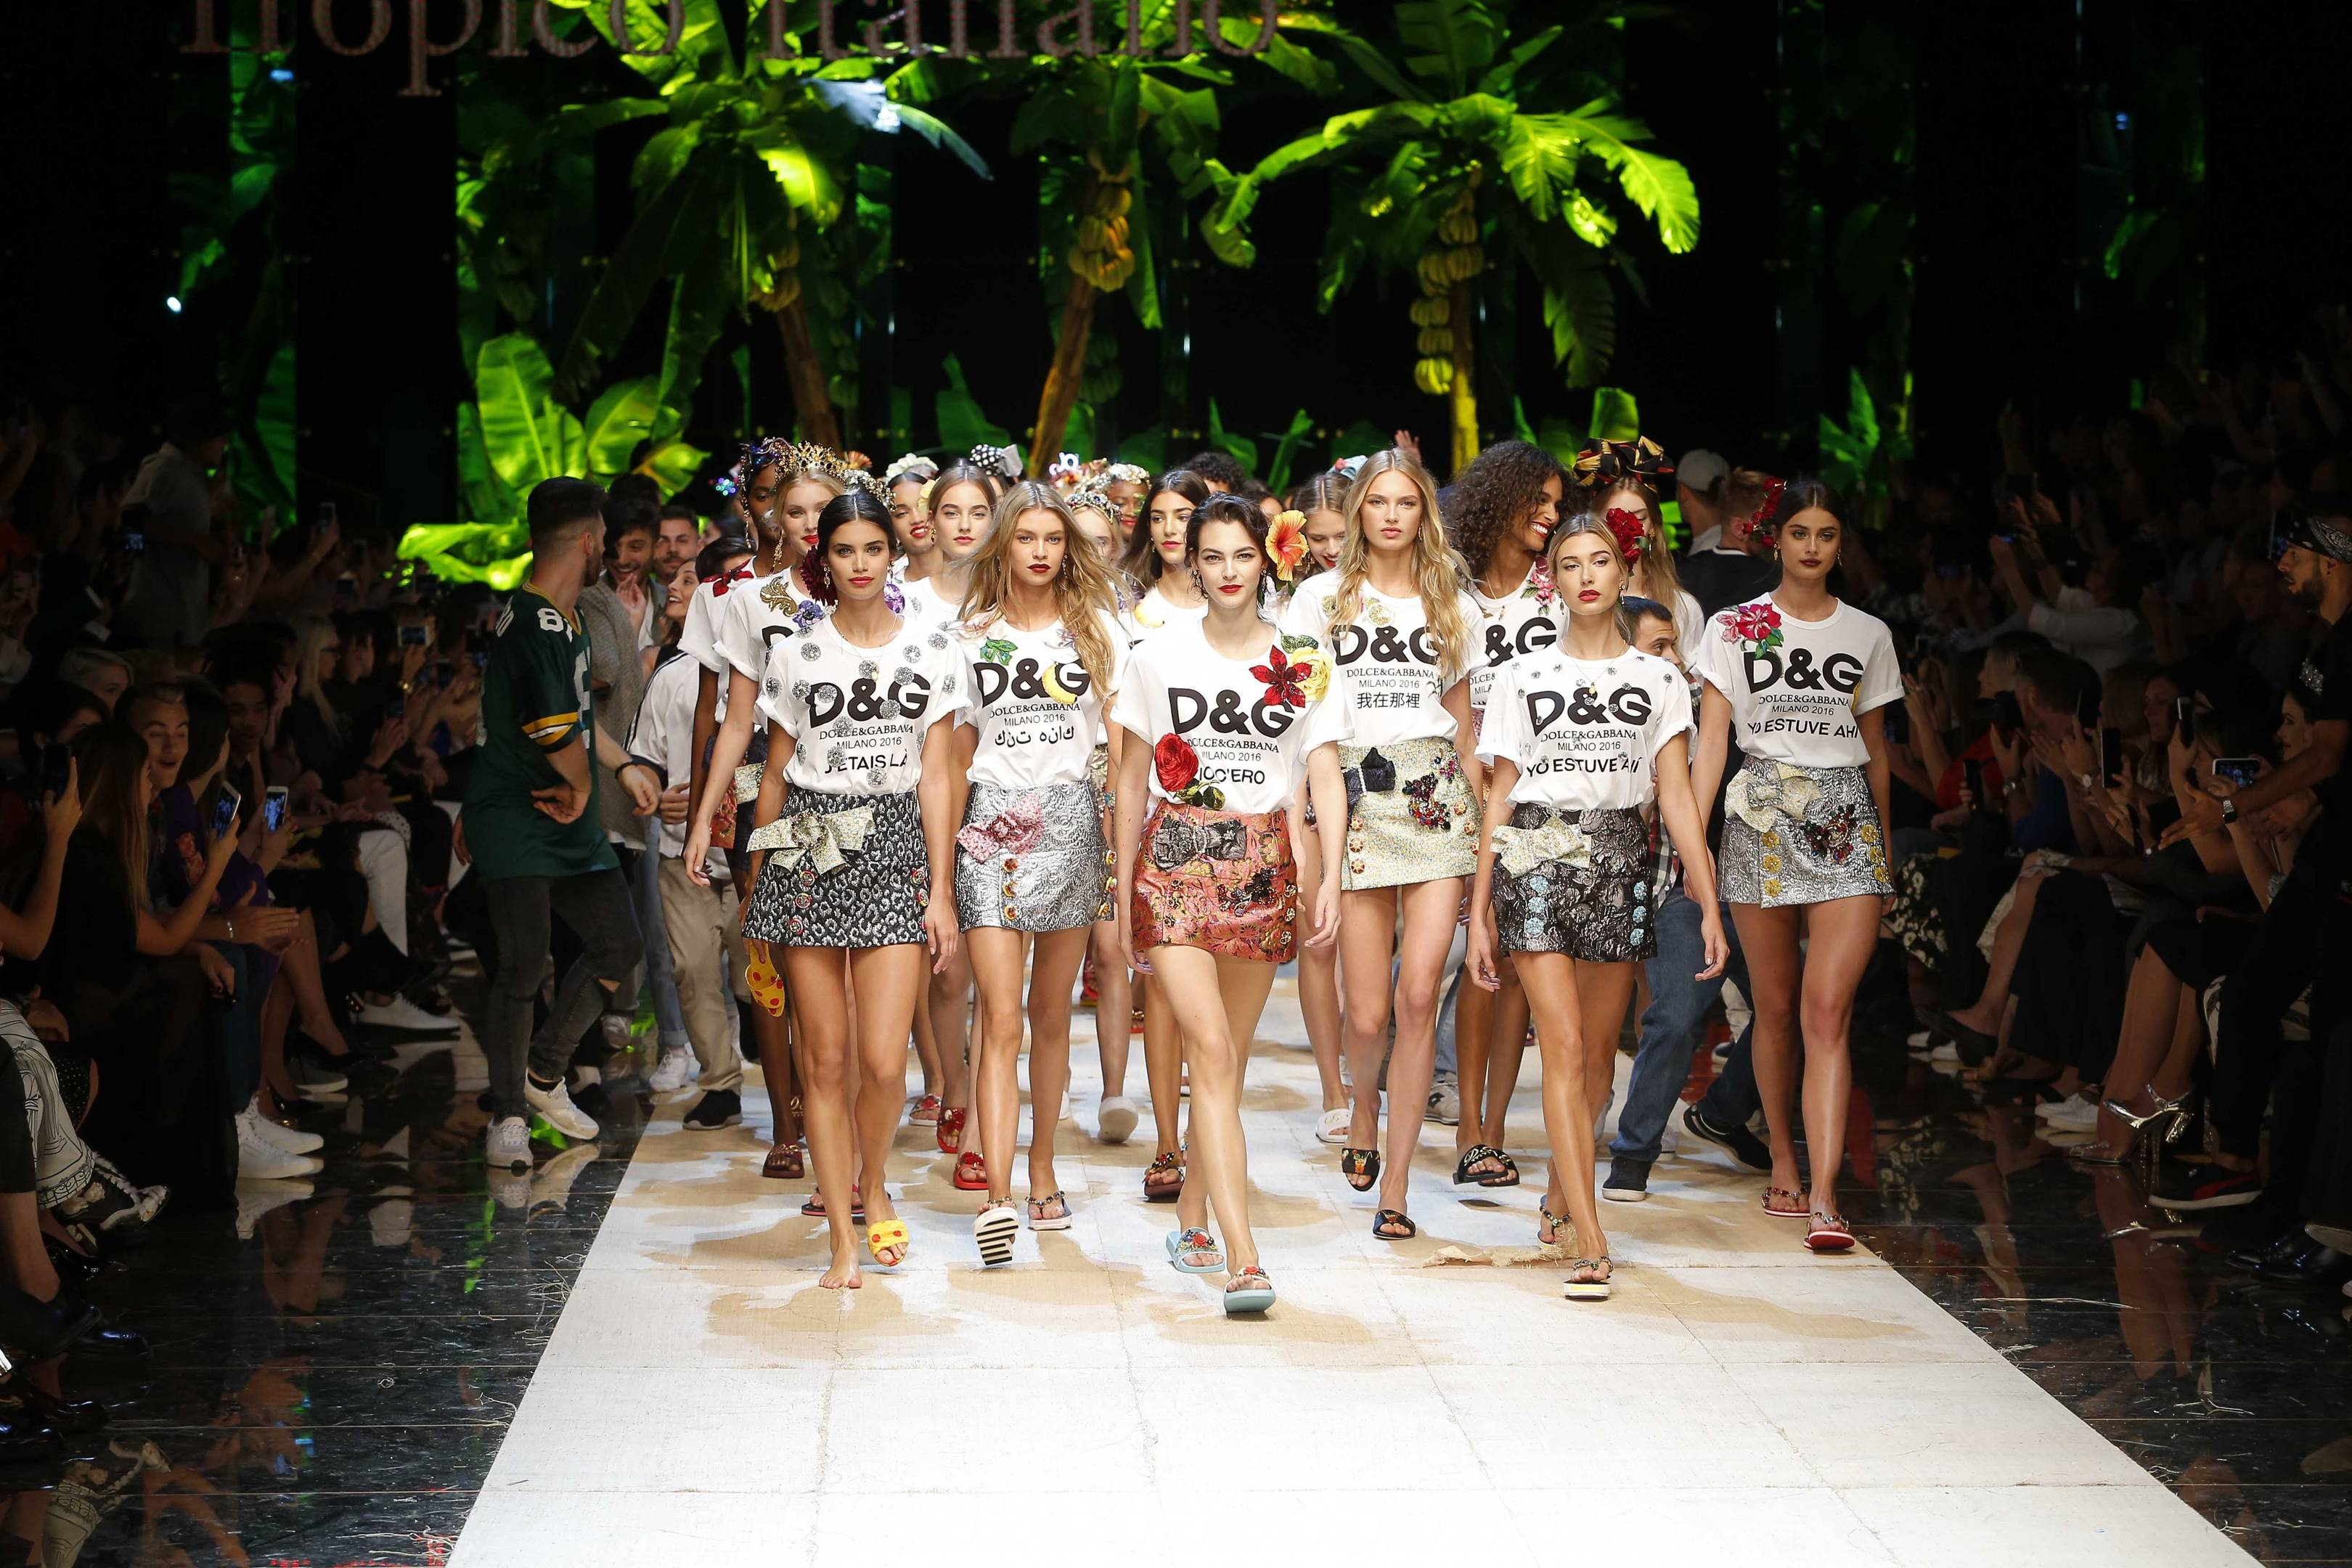 0609b6b14d737 Suzy Menkes reviews the Dolce   Gabbana show at Milan Fashion Week    British Vogue